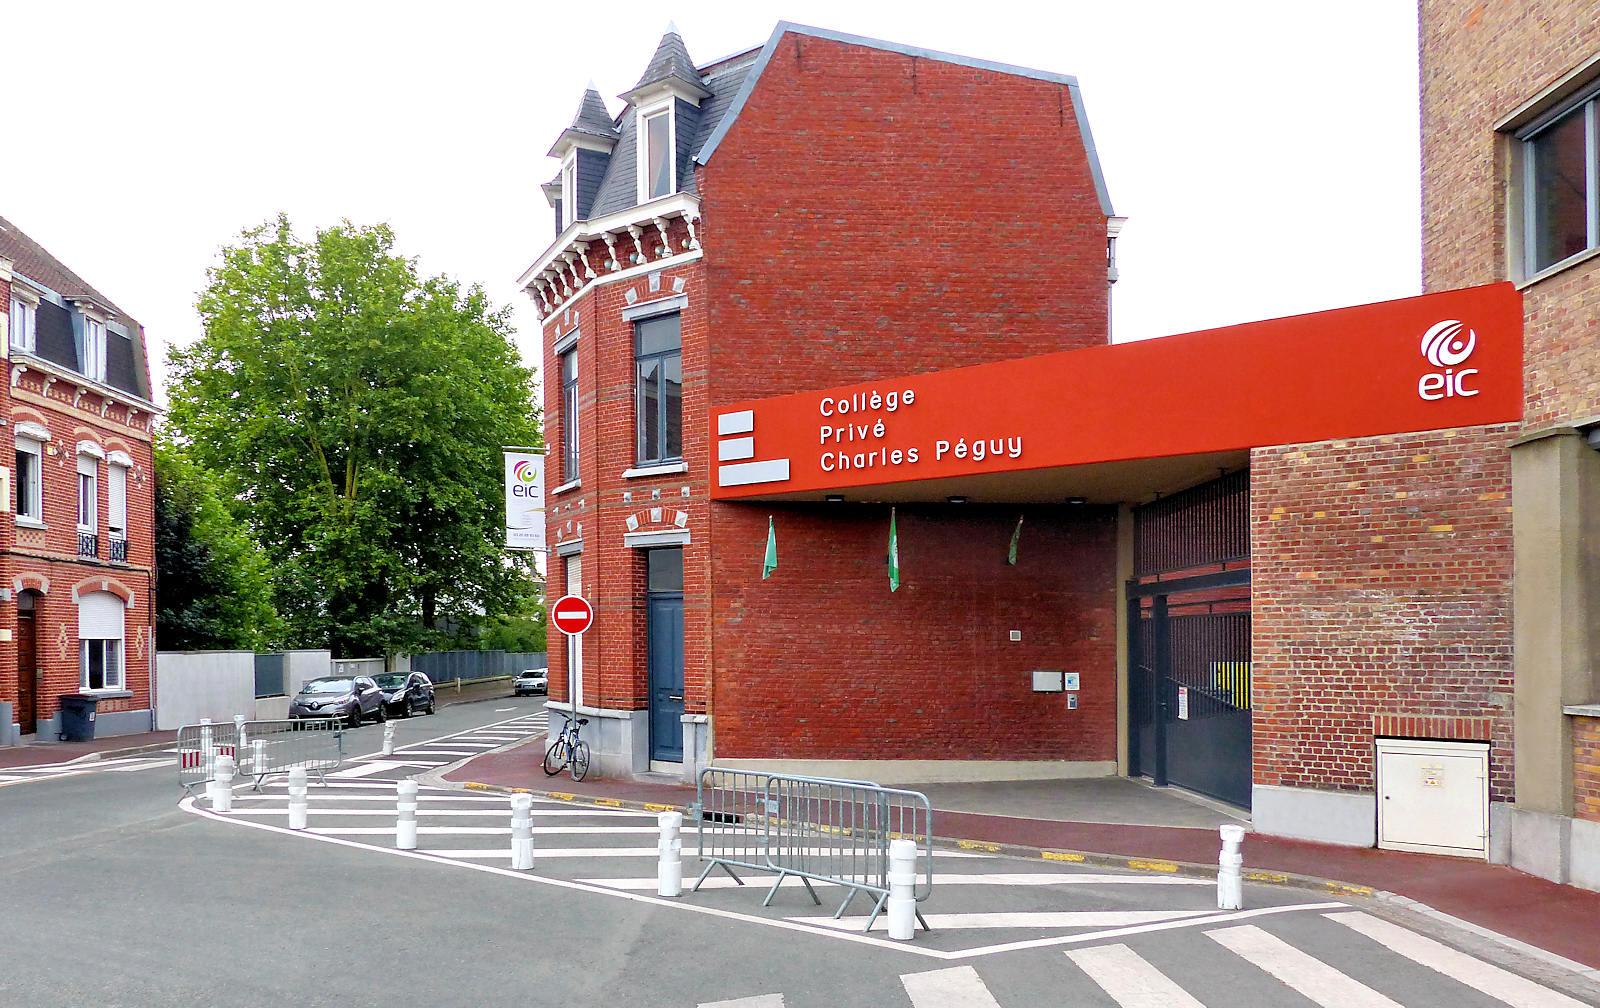 Collège Charles Péguy, Tourcoing